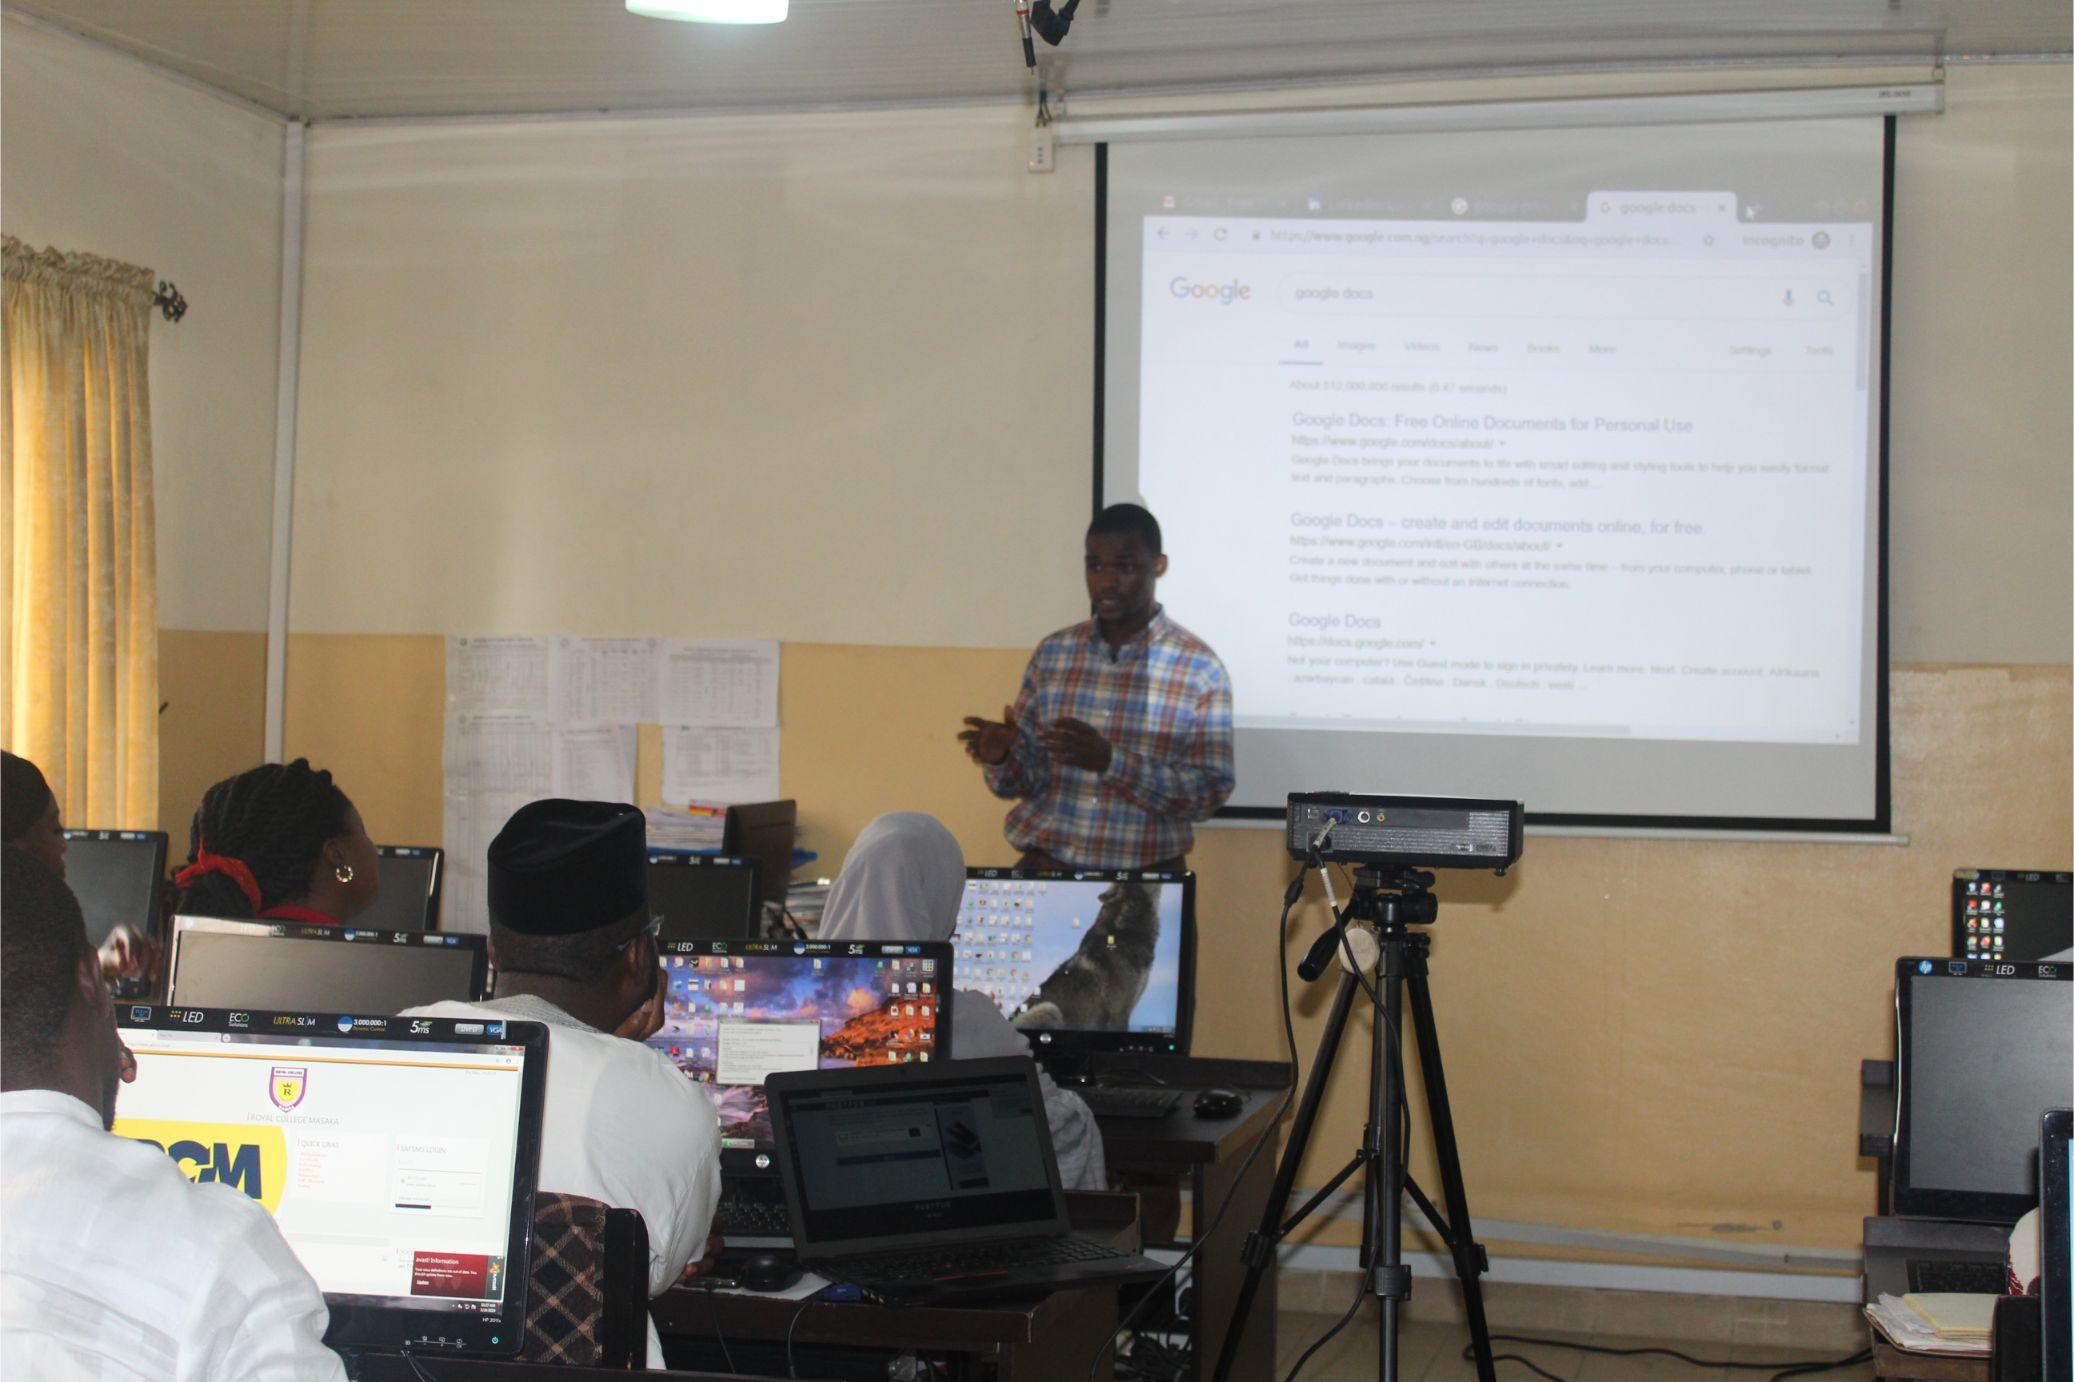 educonnect training session